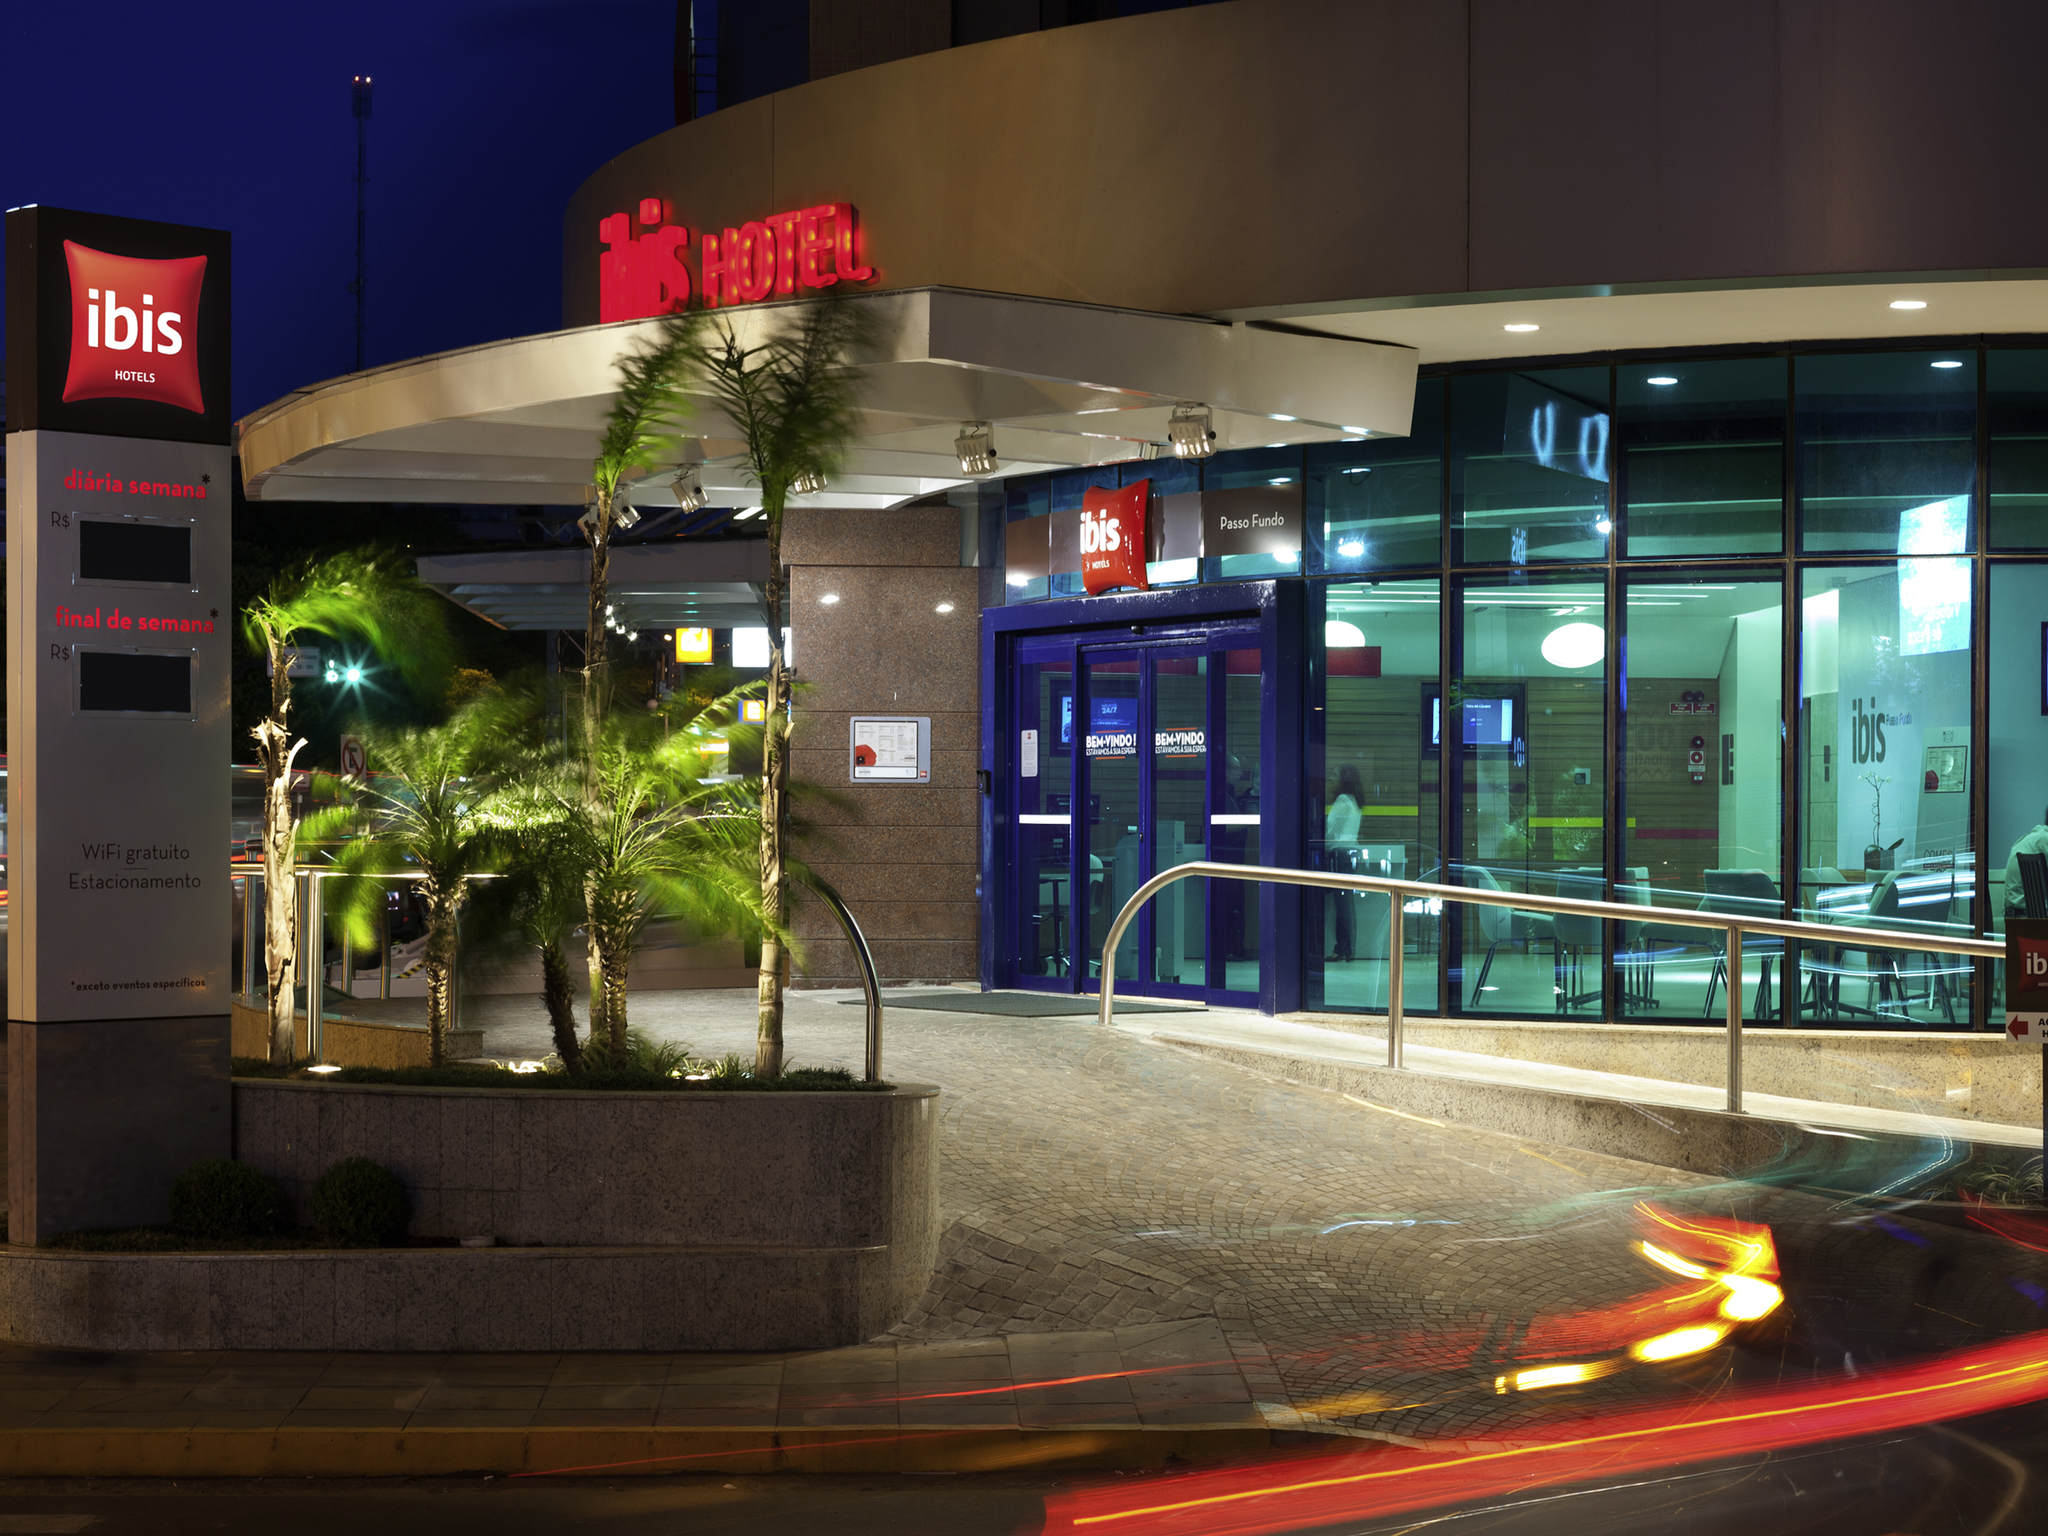 Otel – ibis Passo Fundo Centro